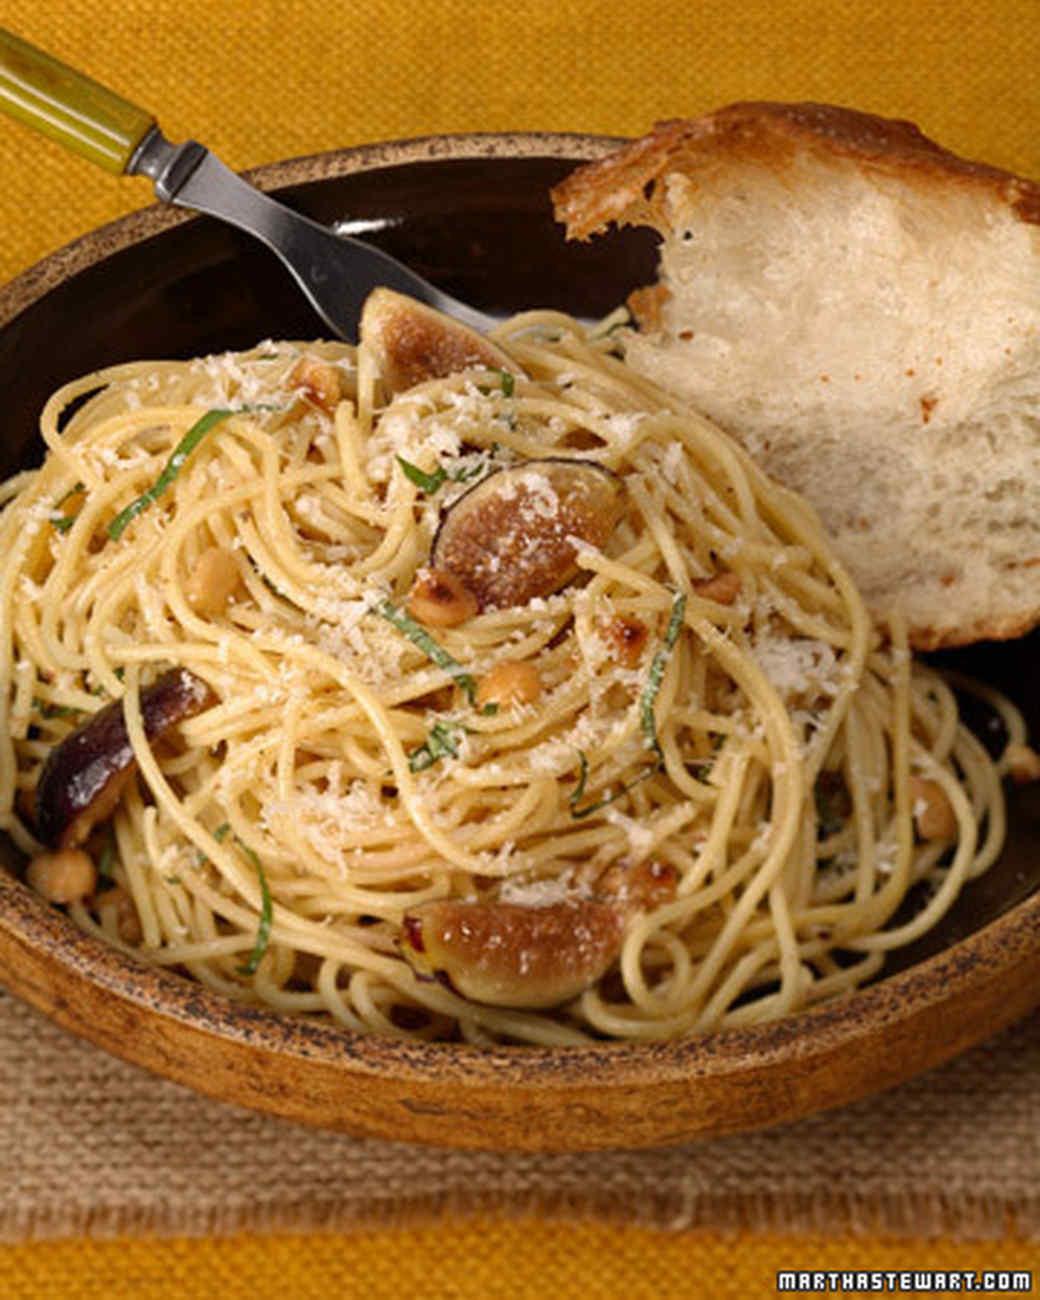 3002_91107_spaghettiwithfig.jpg